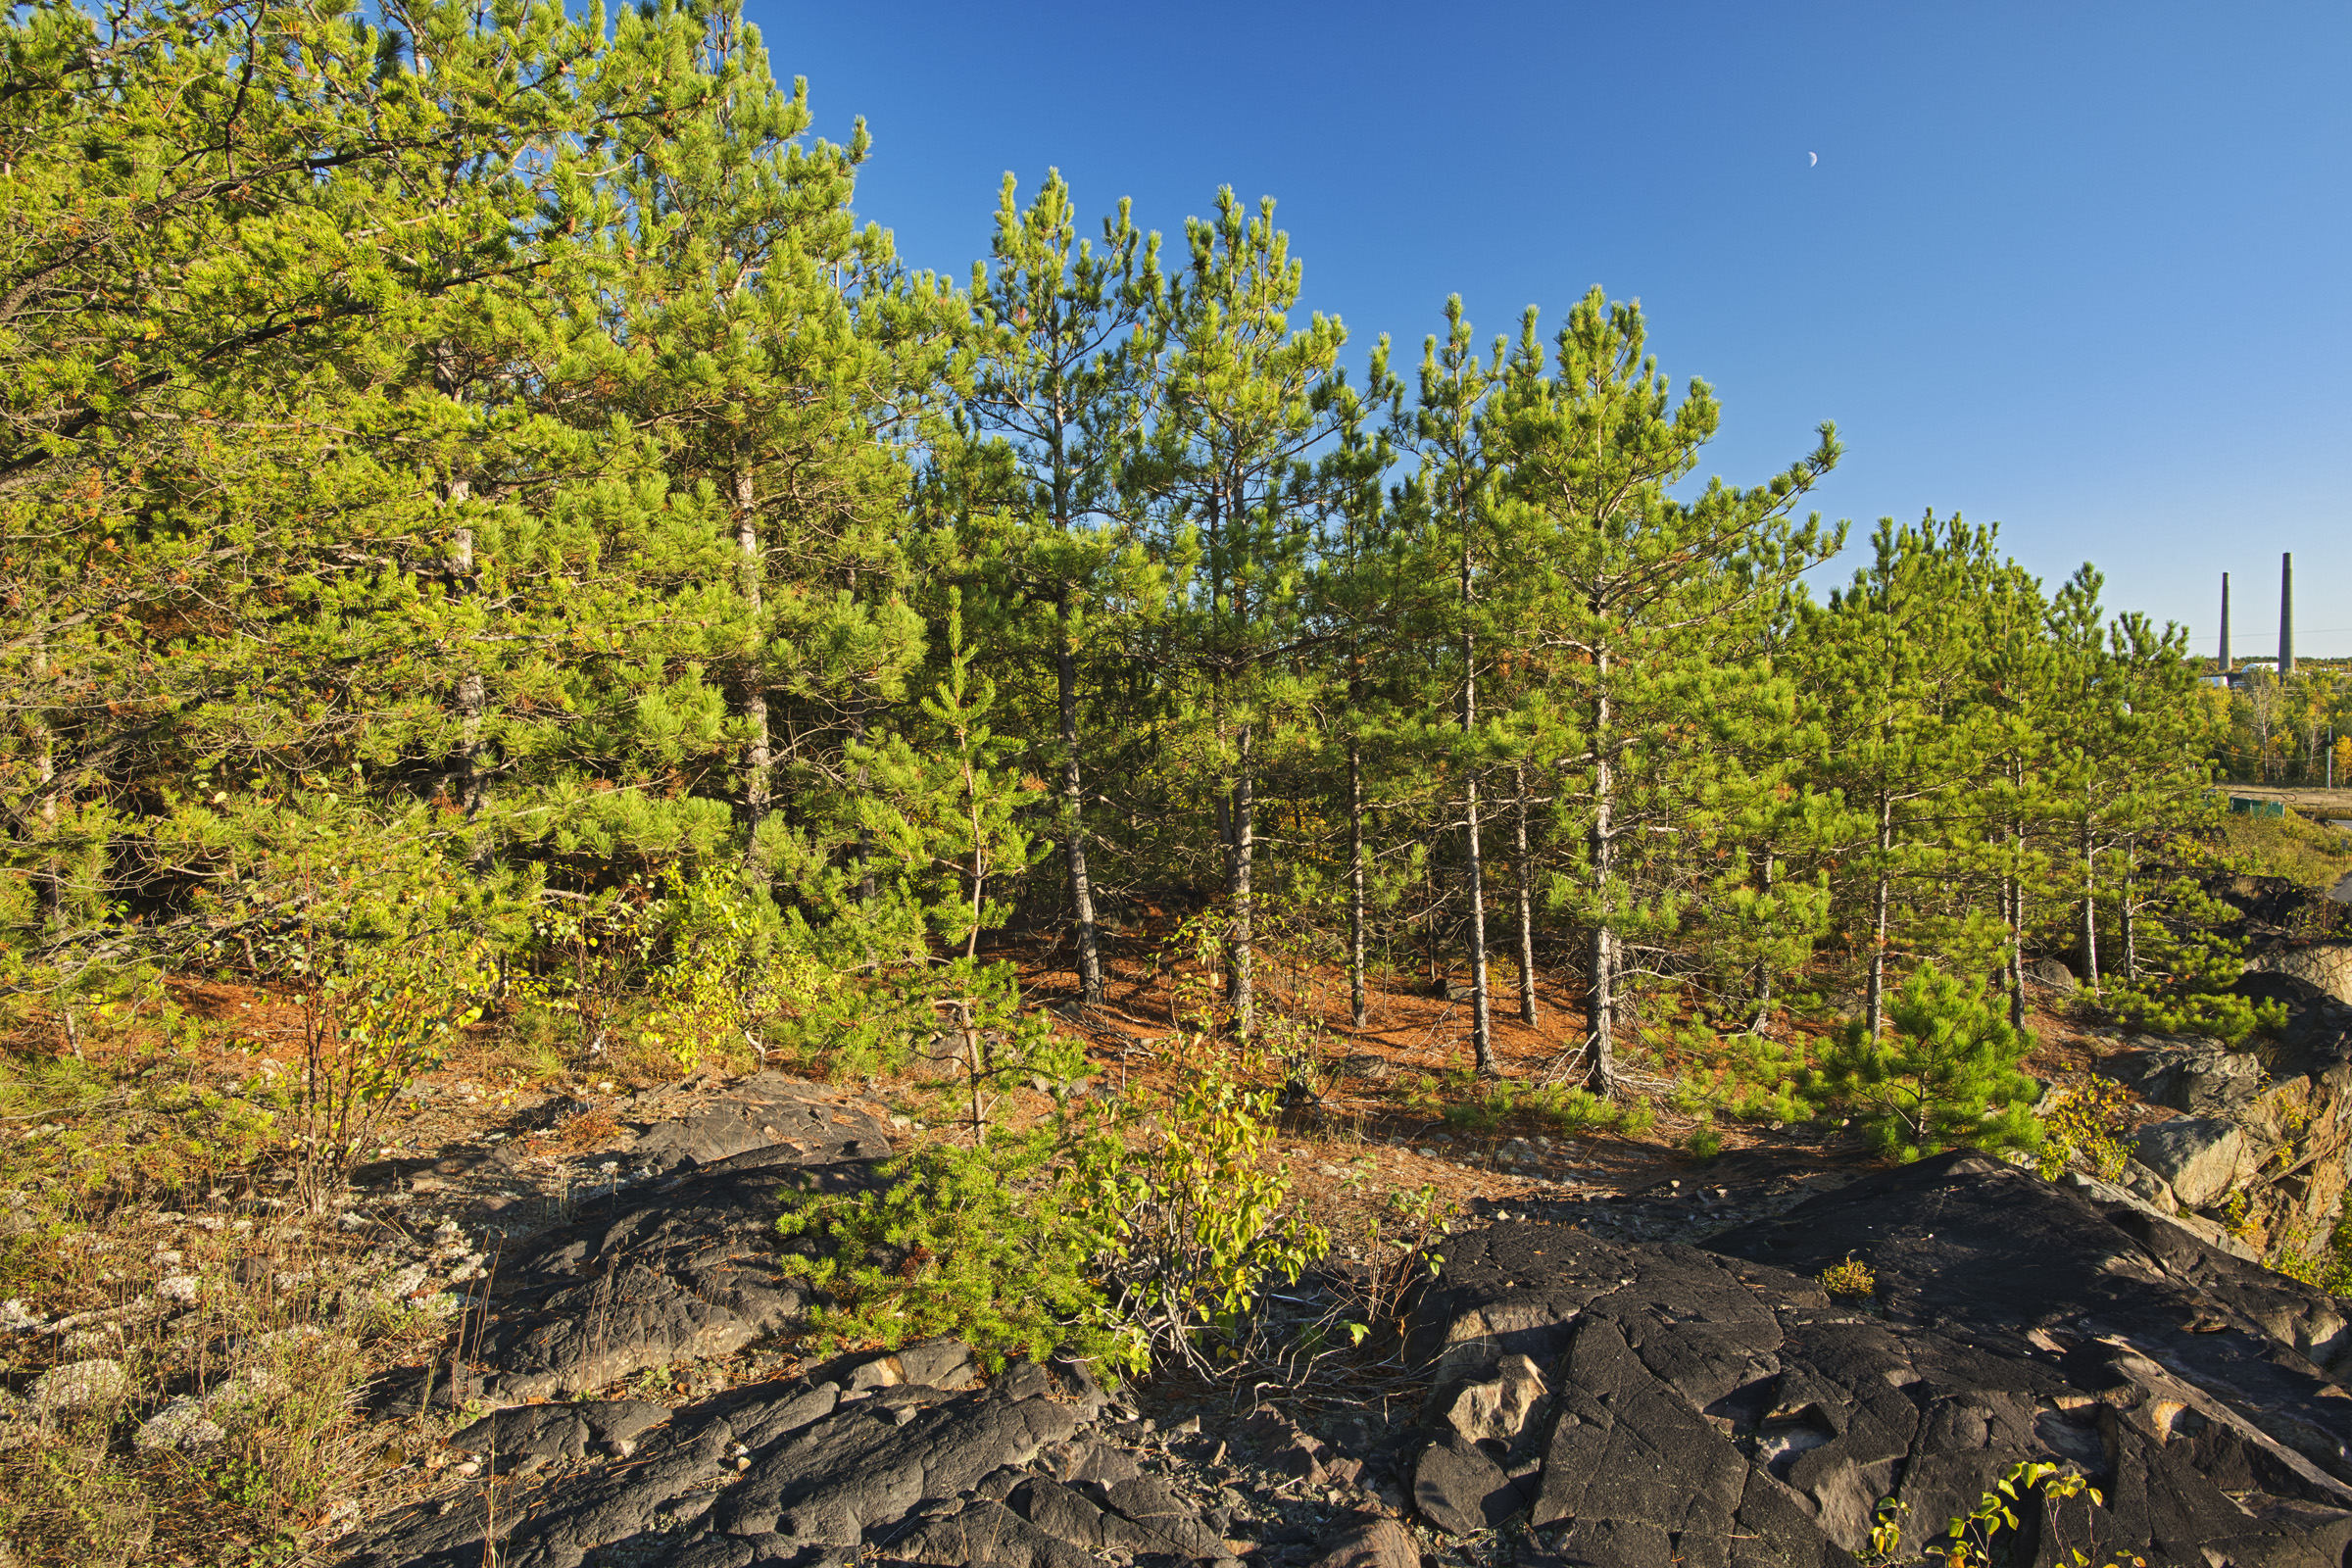 ©  Mike Grandmaison, Pine Trees on the Jane Goodall Interpretive Trail, 2019, Sudbury, Ontario